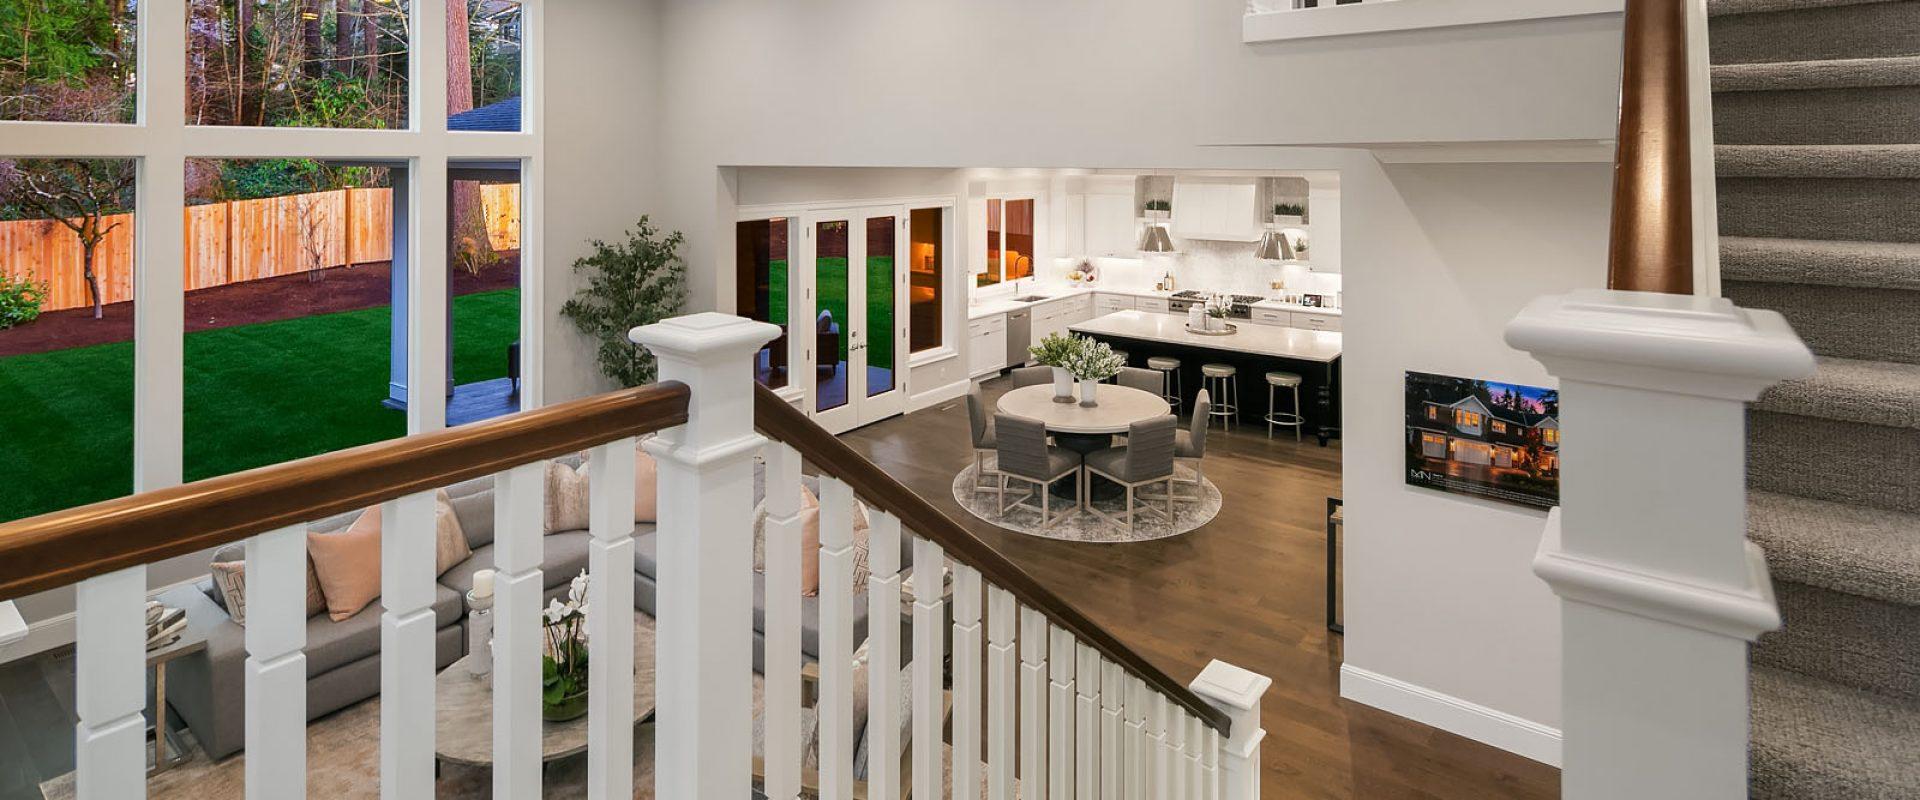 142-15056 NE 11th Pl-bellevue-wa-mn-custom-homes-greatroom-detail-2